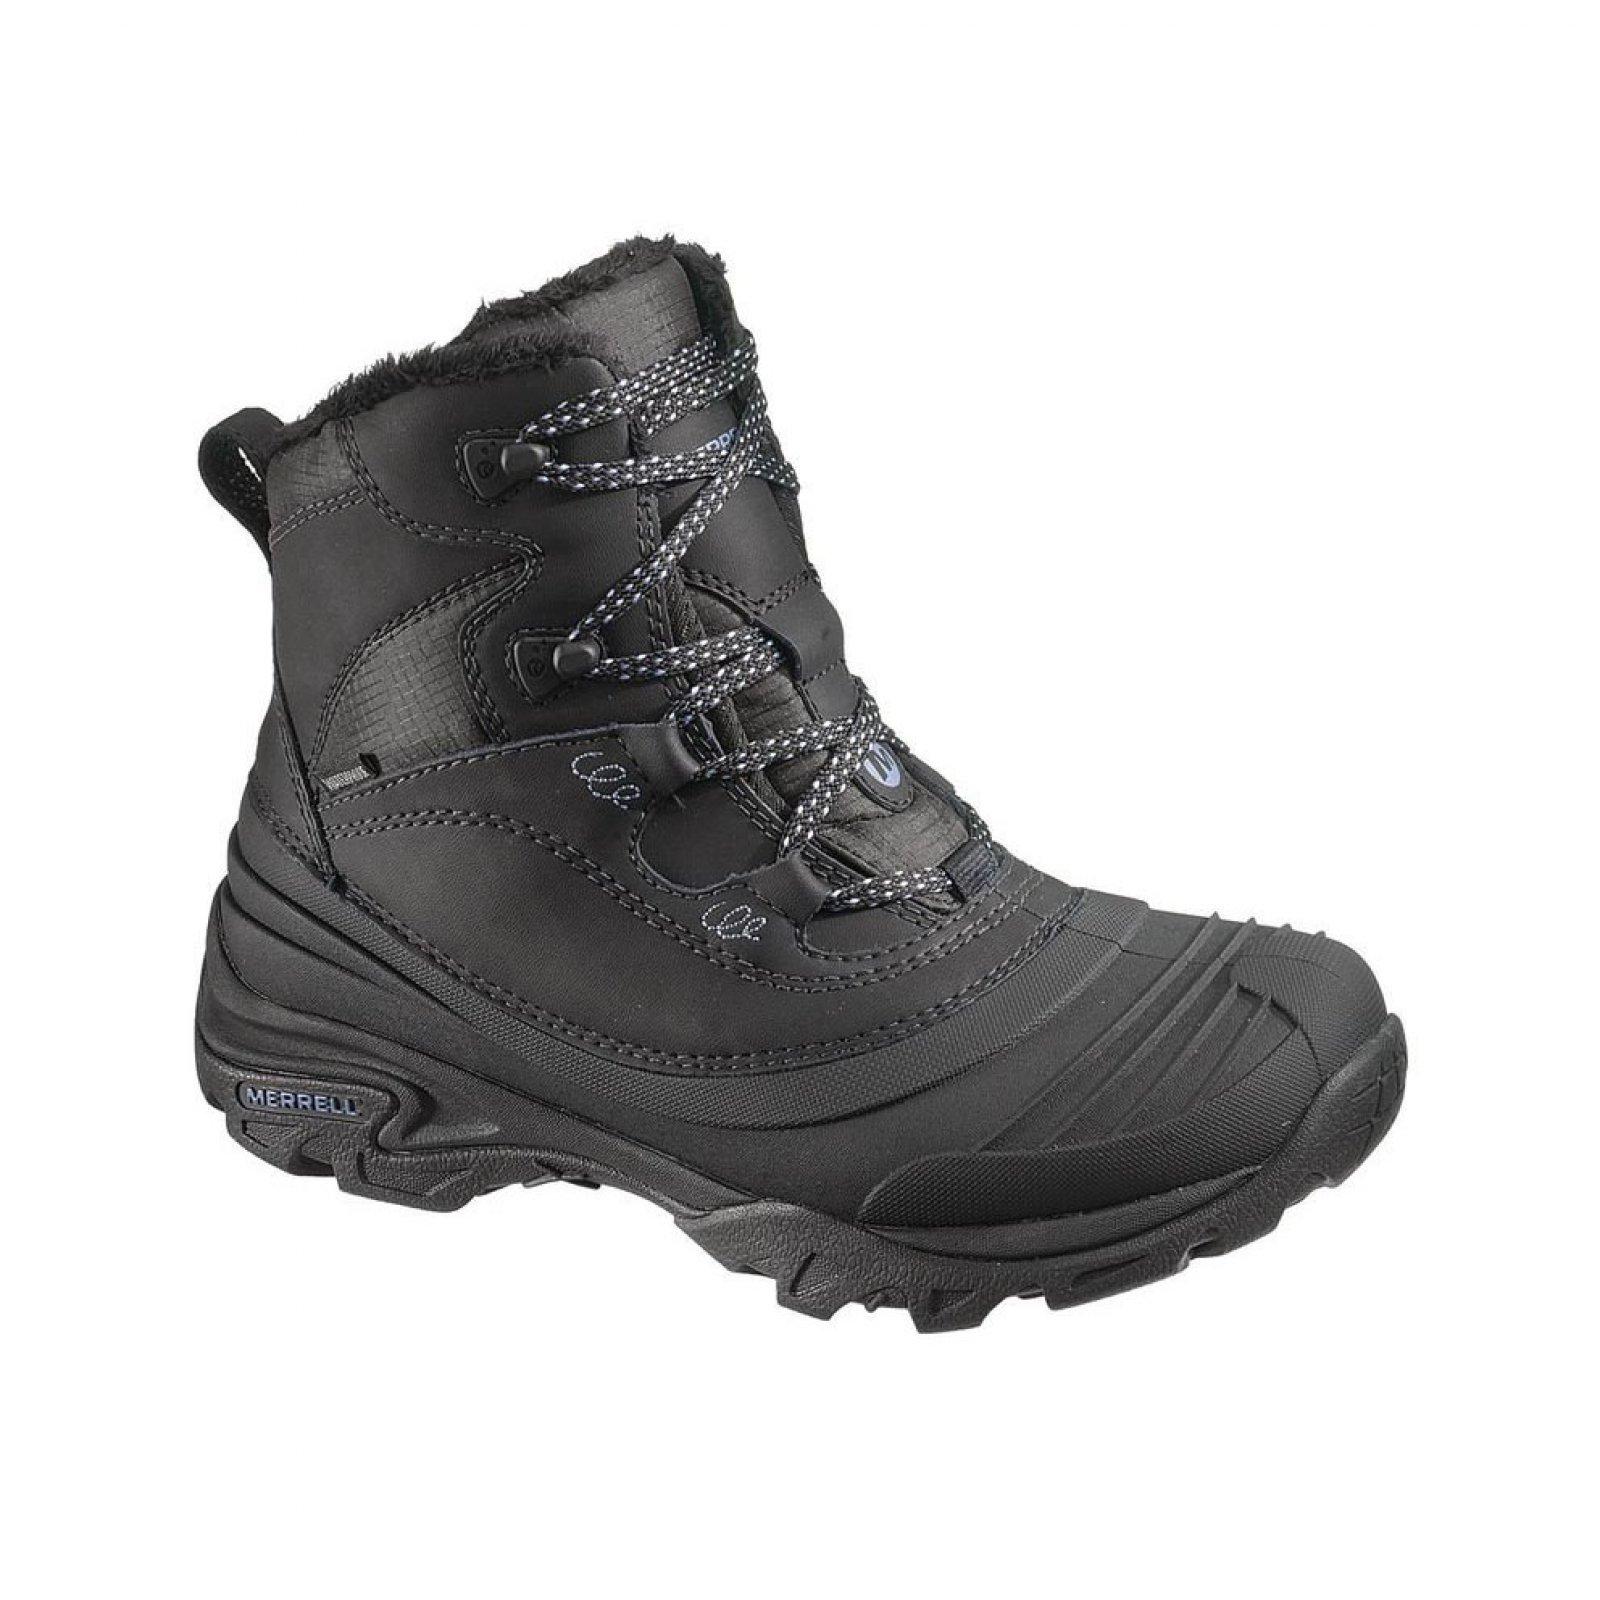 d3345093a54 Outdoorové boty Merrell Snowbound Mid Waterproof W J55624 - Actisport.cz